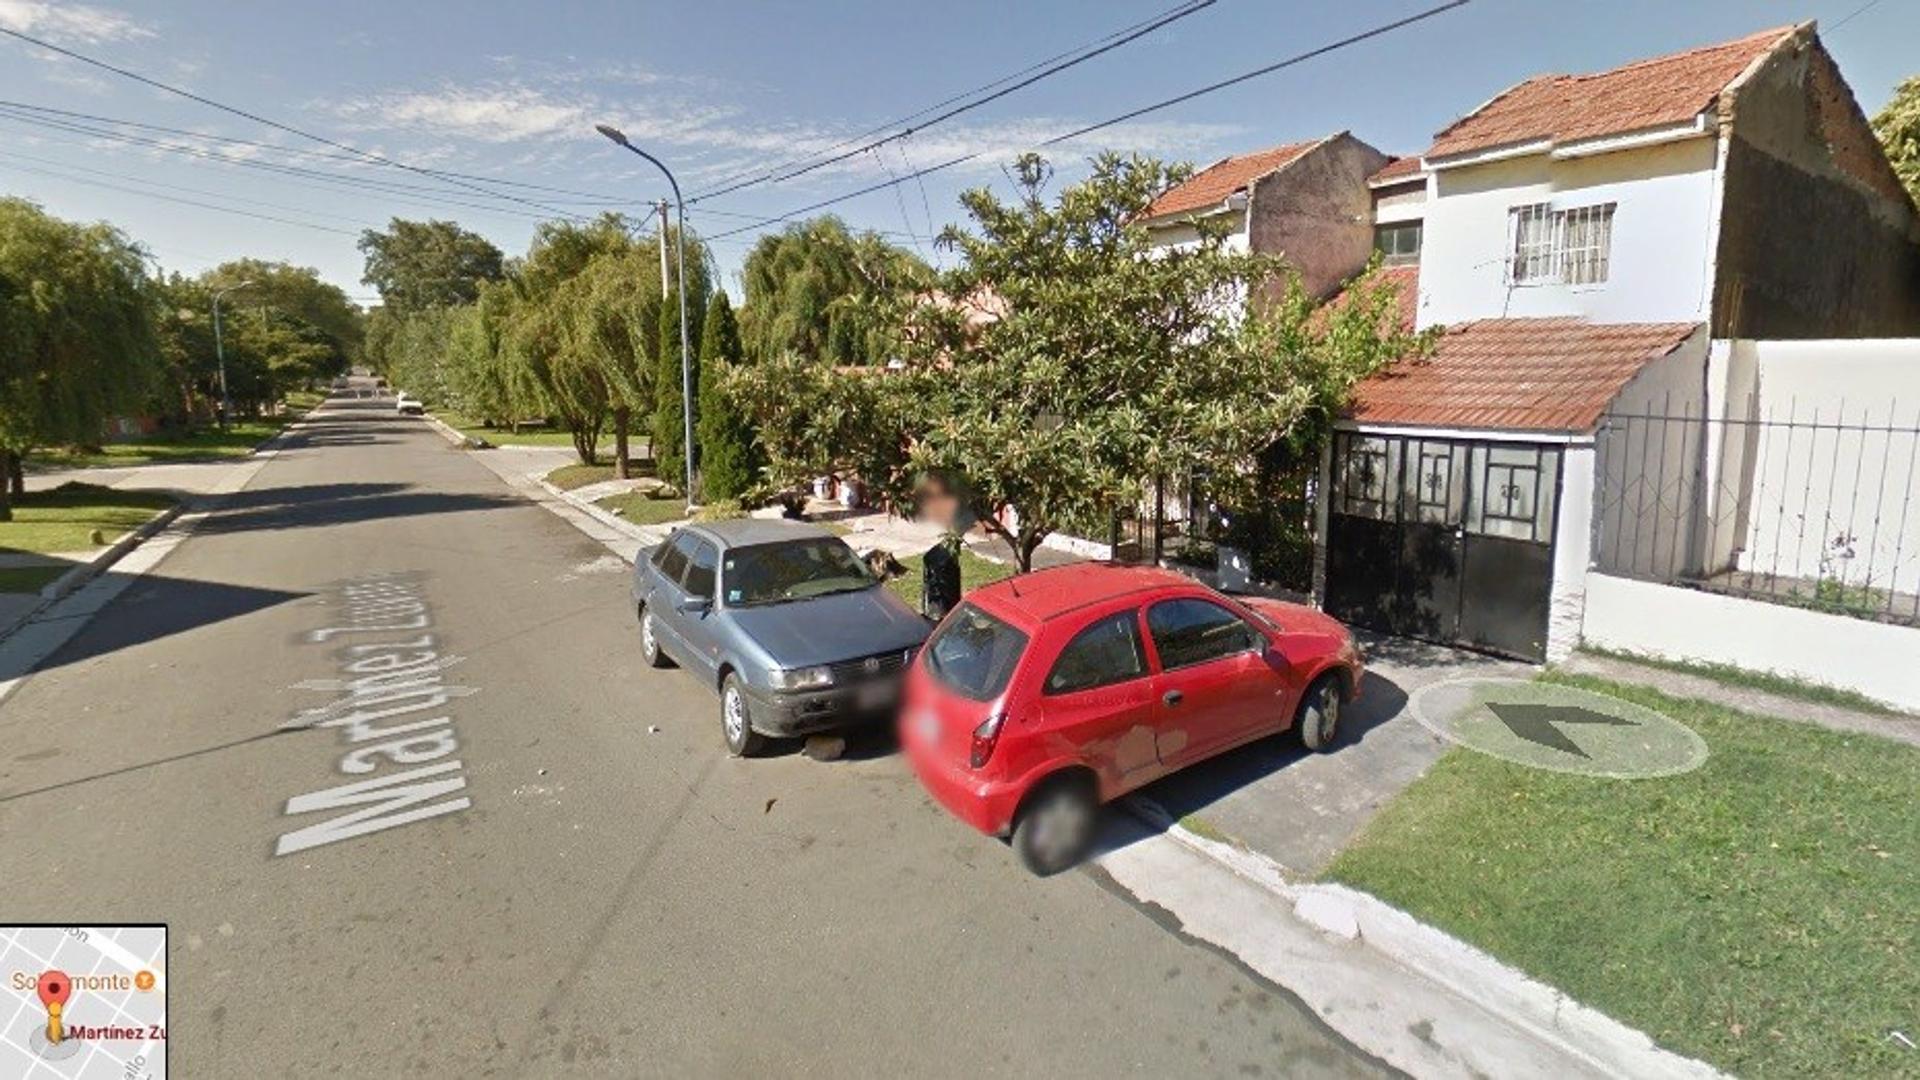 CASA 5 AMB PATIO TZA COCHERA . LOS PINARES .